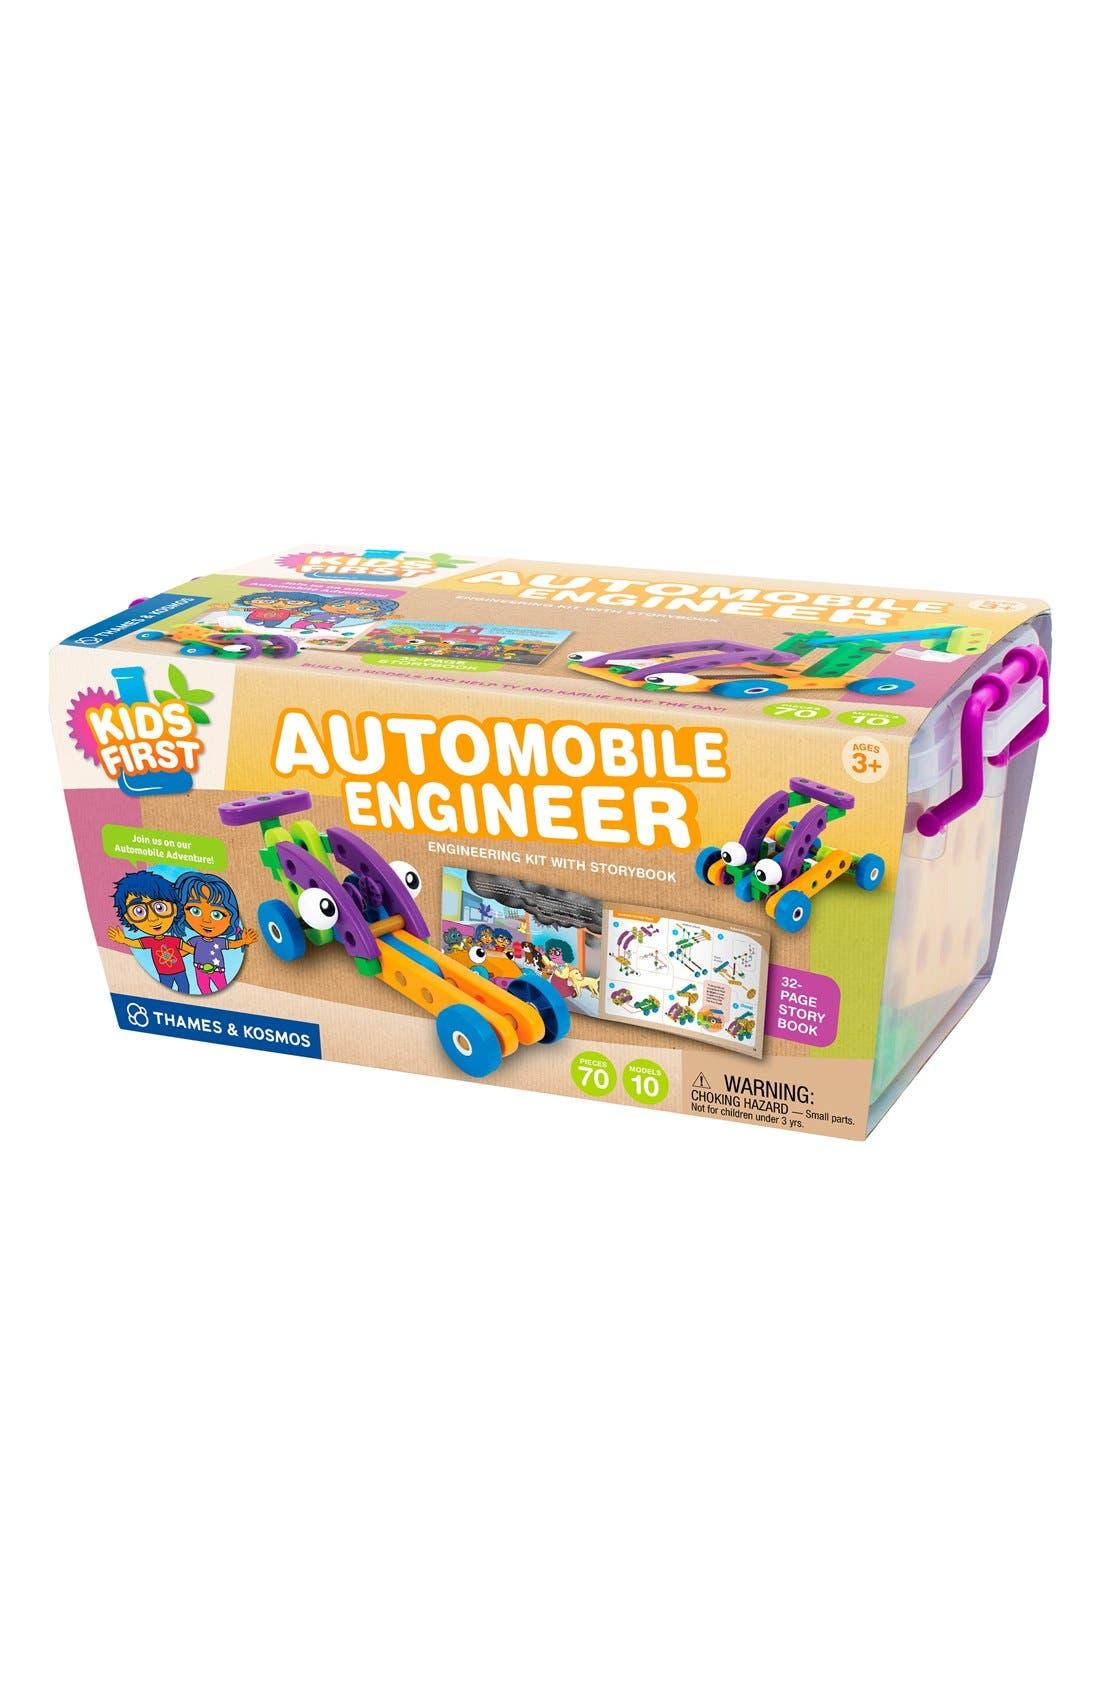 Thames & Kosmos 'Kids First - Automobile Engineer' Kit